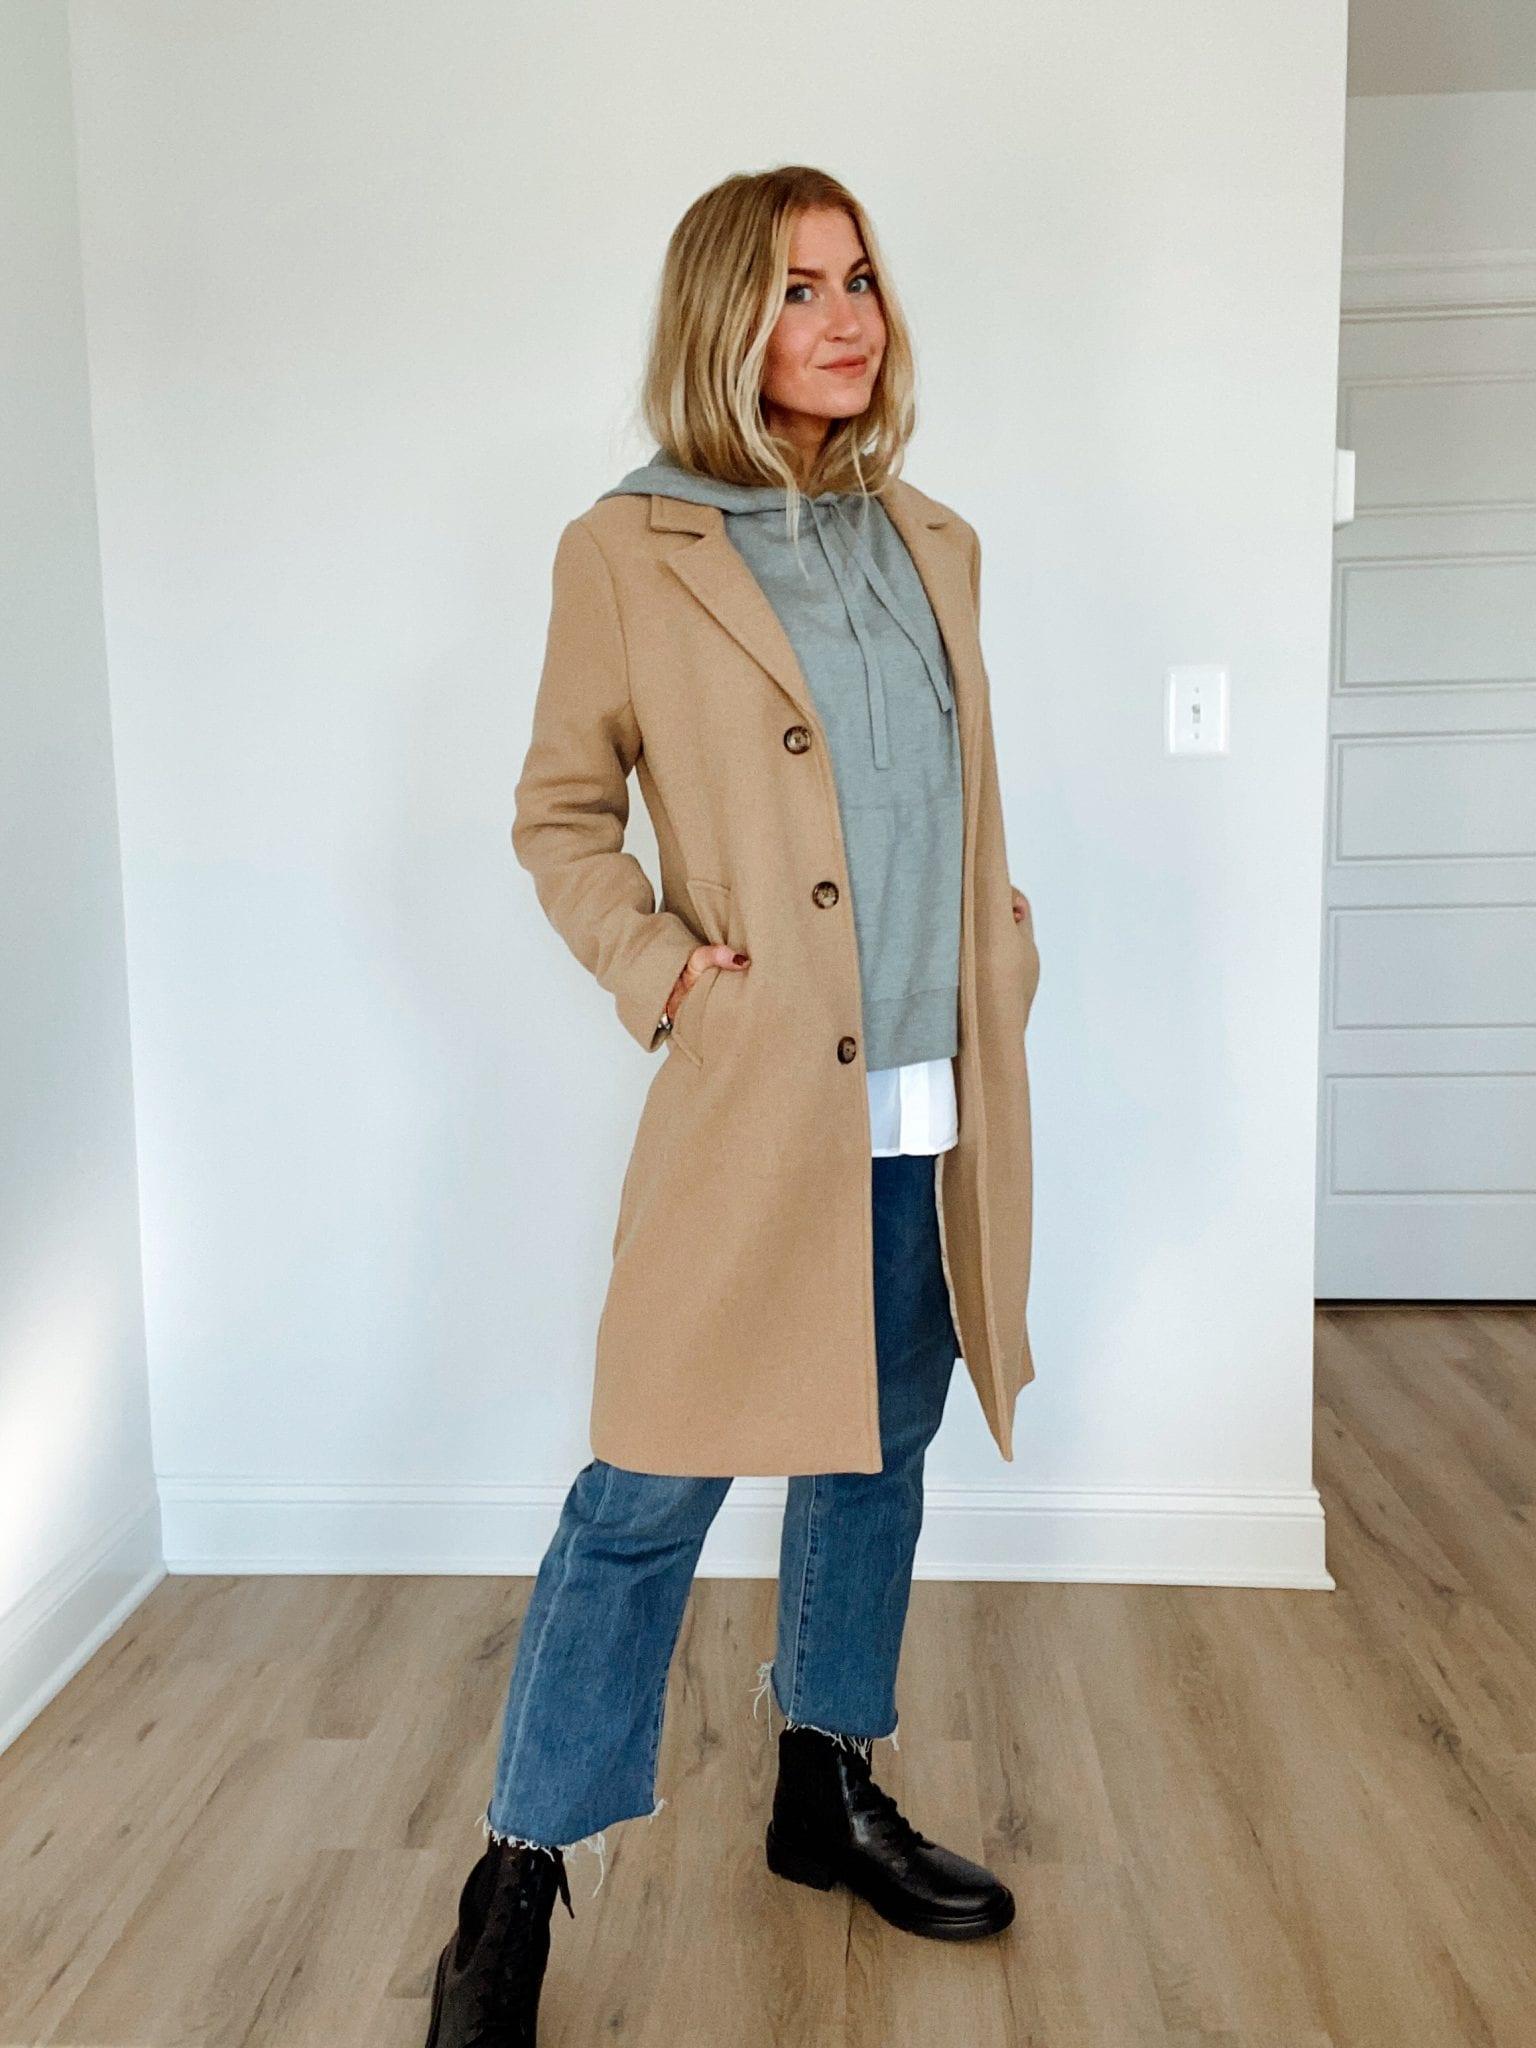 Daily Look: Sweatshirt + camel coat + combat boots